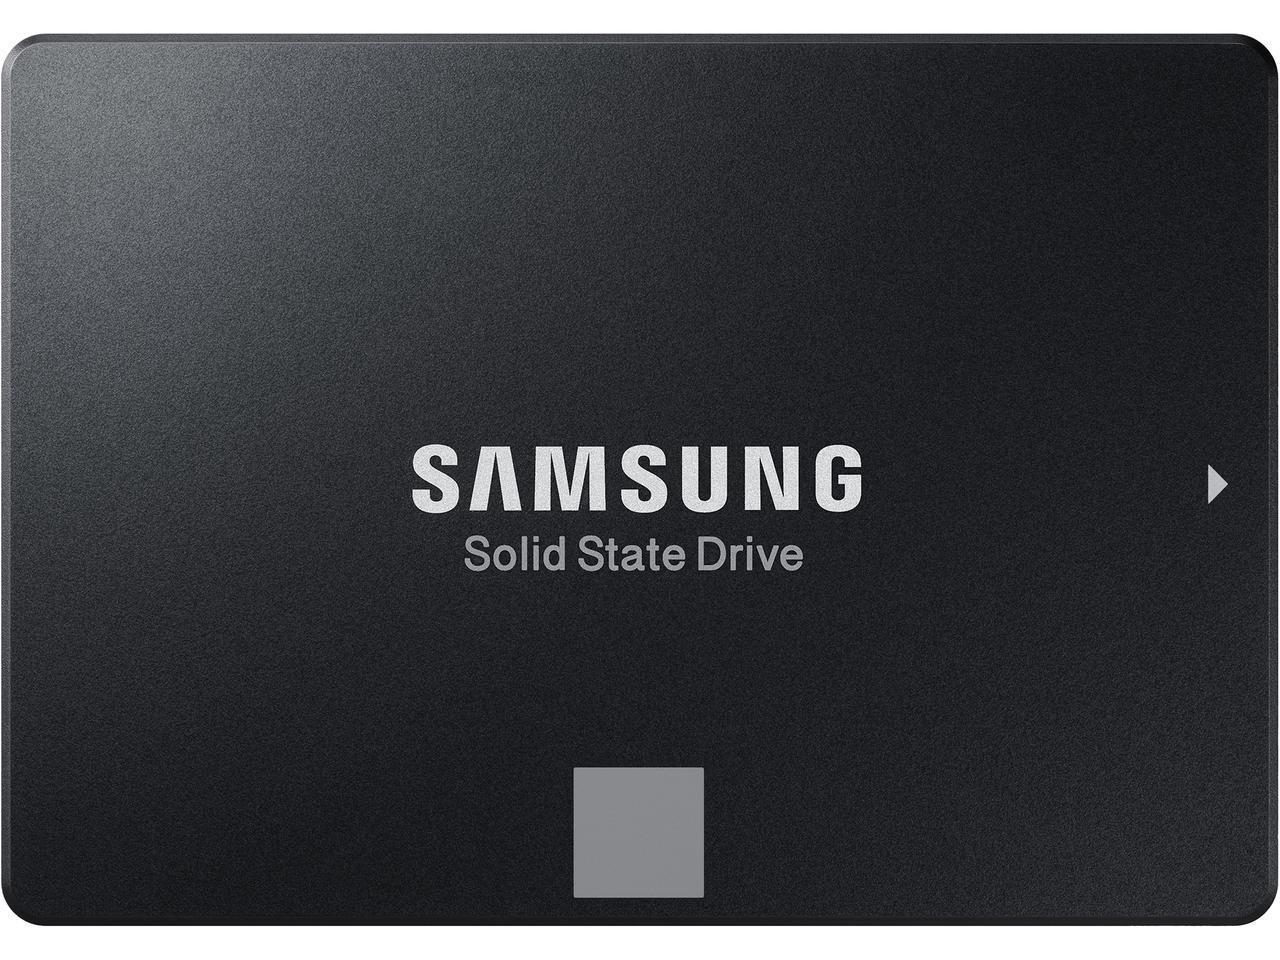 Samsung 860 EVO SSD 500GB ($145)